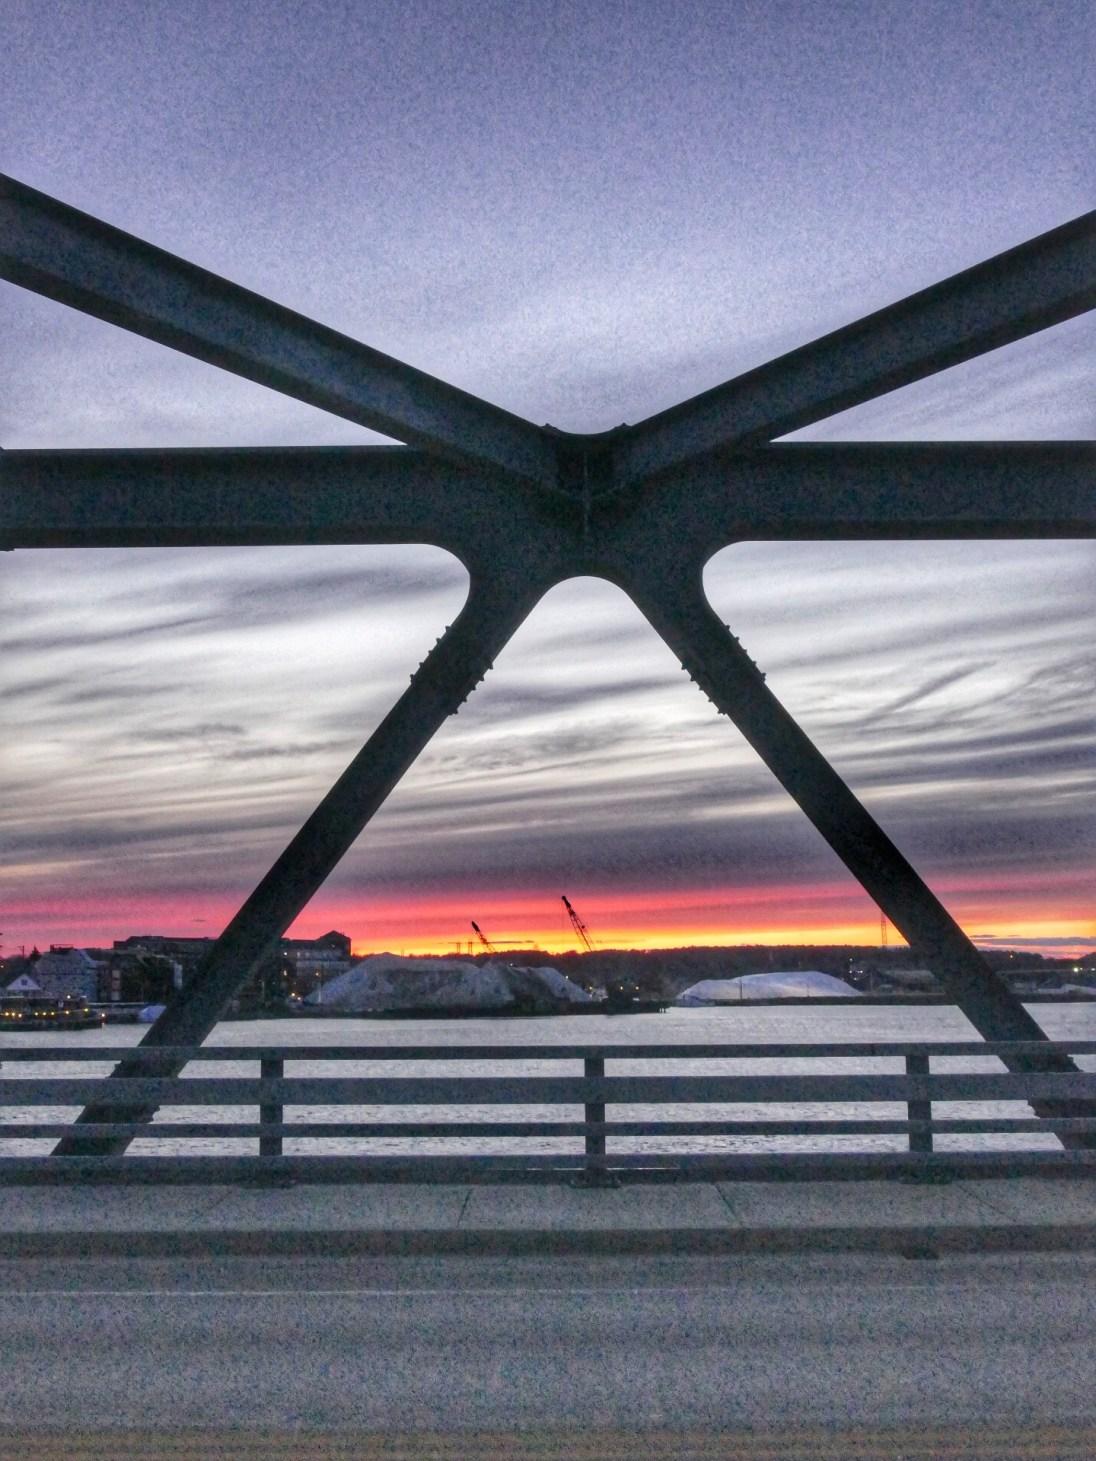 From the Memorial Bridge